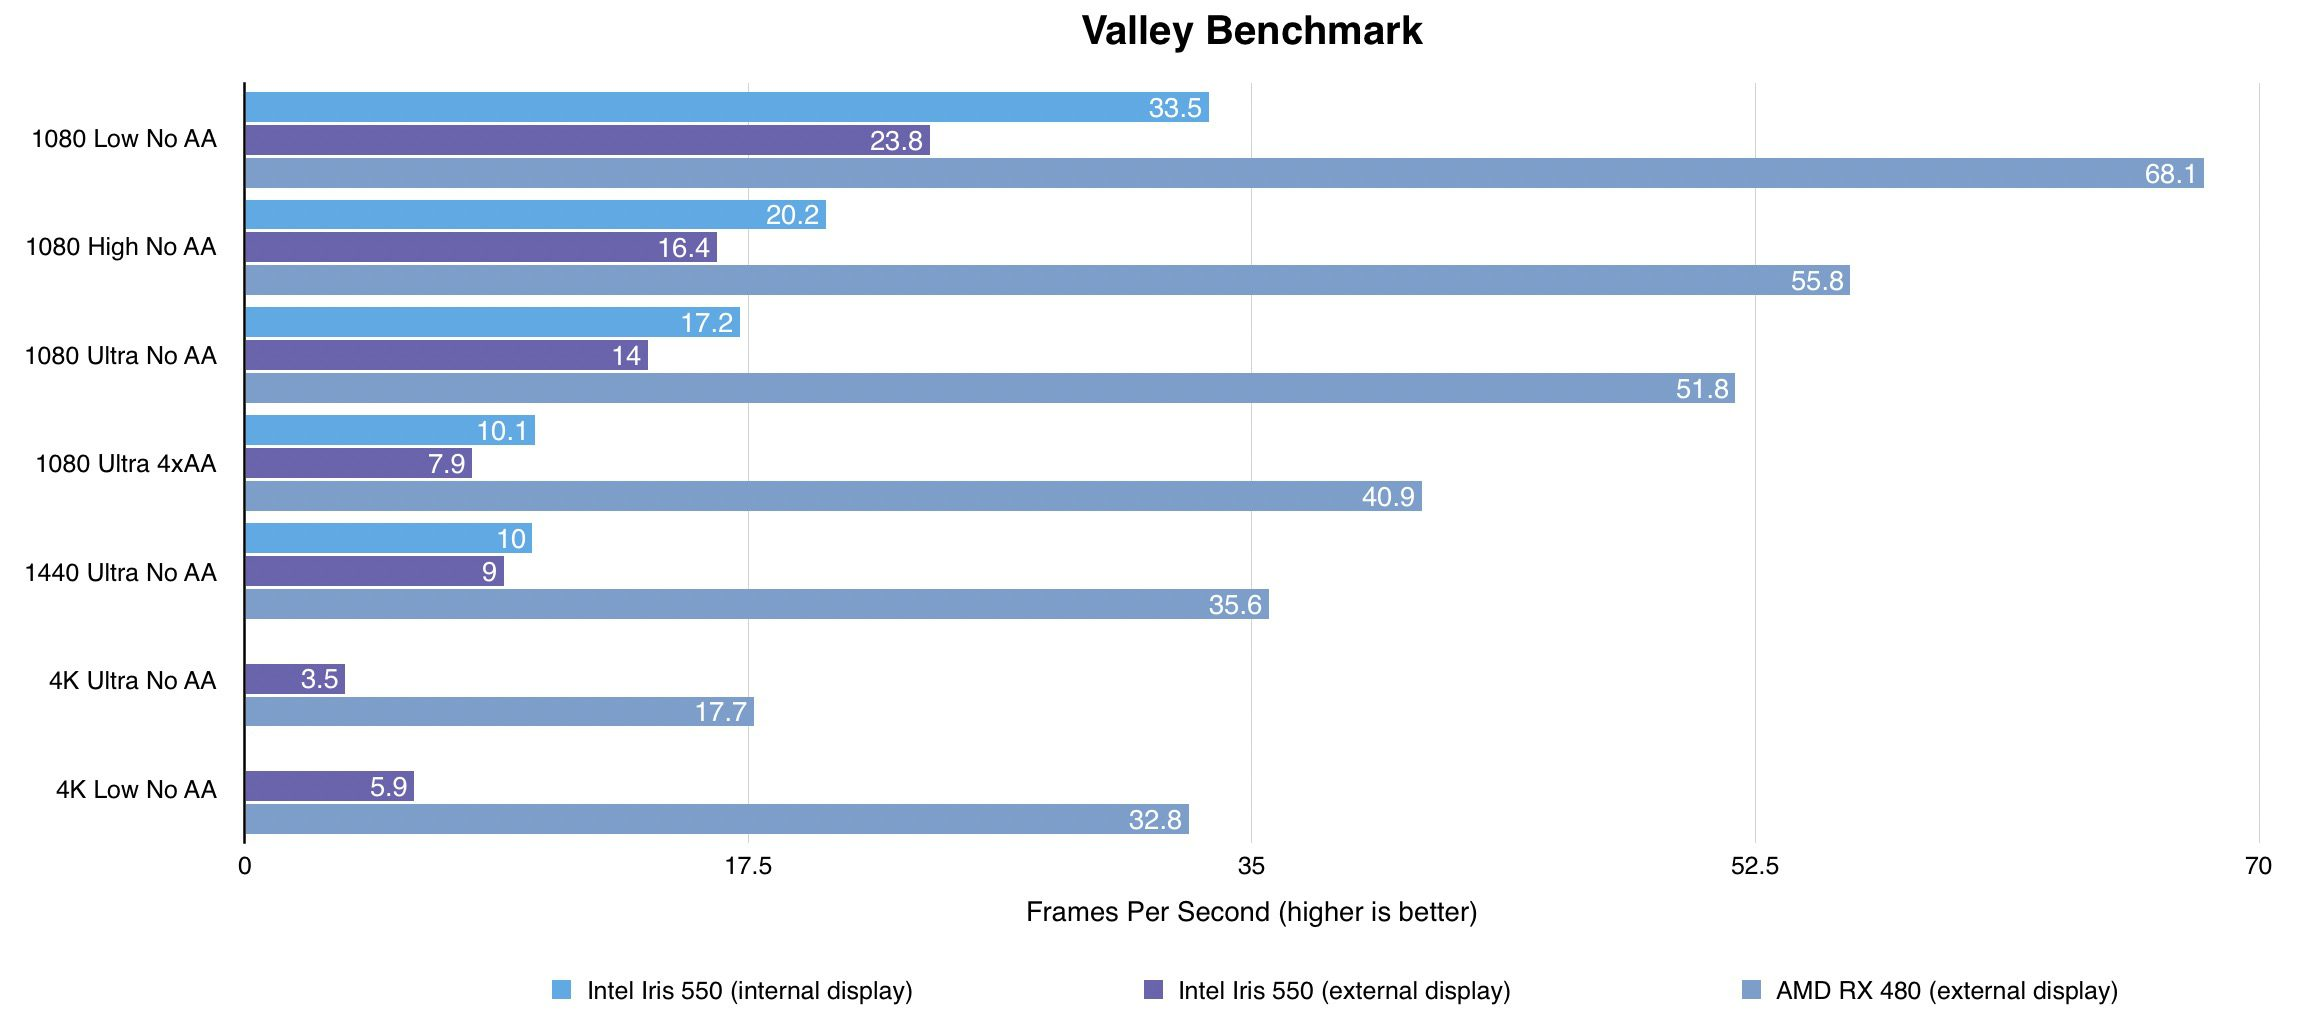 valley-benchmark-egpu-macbook-pro1.jpg